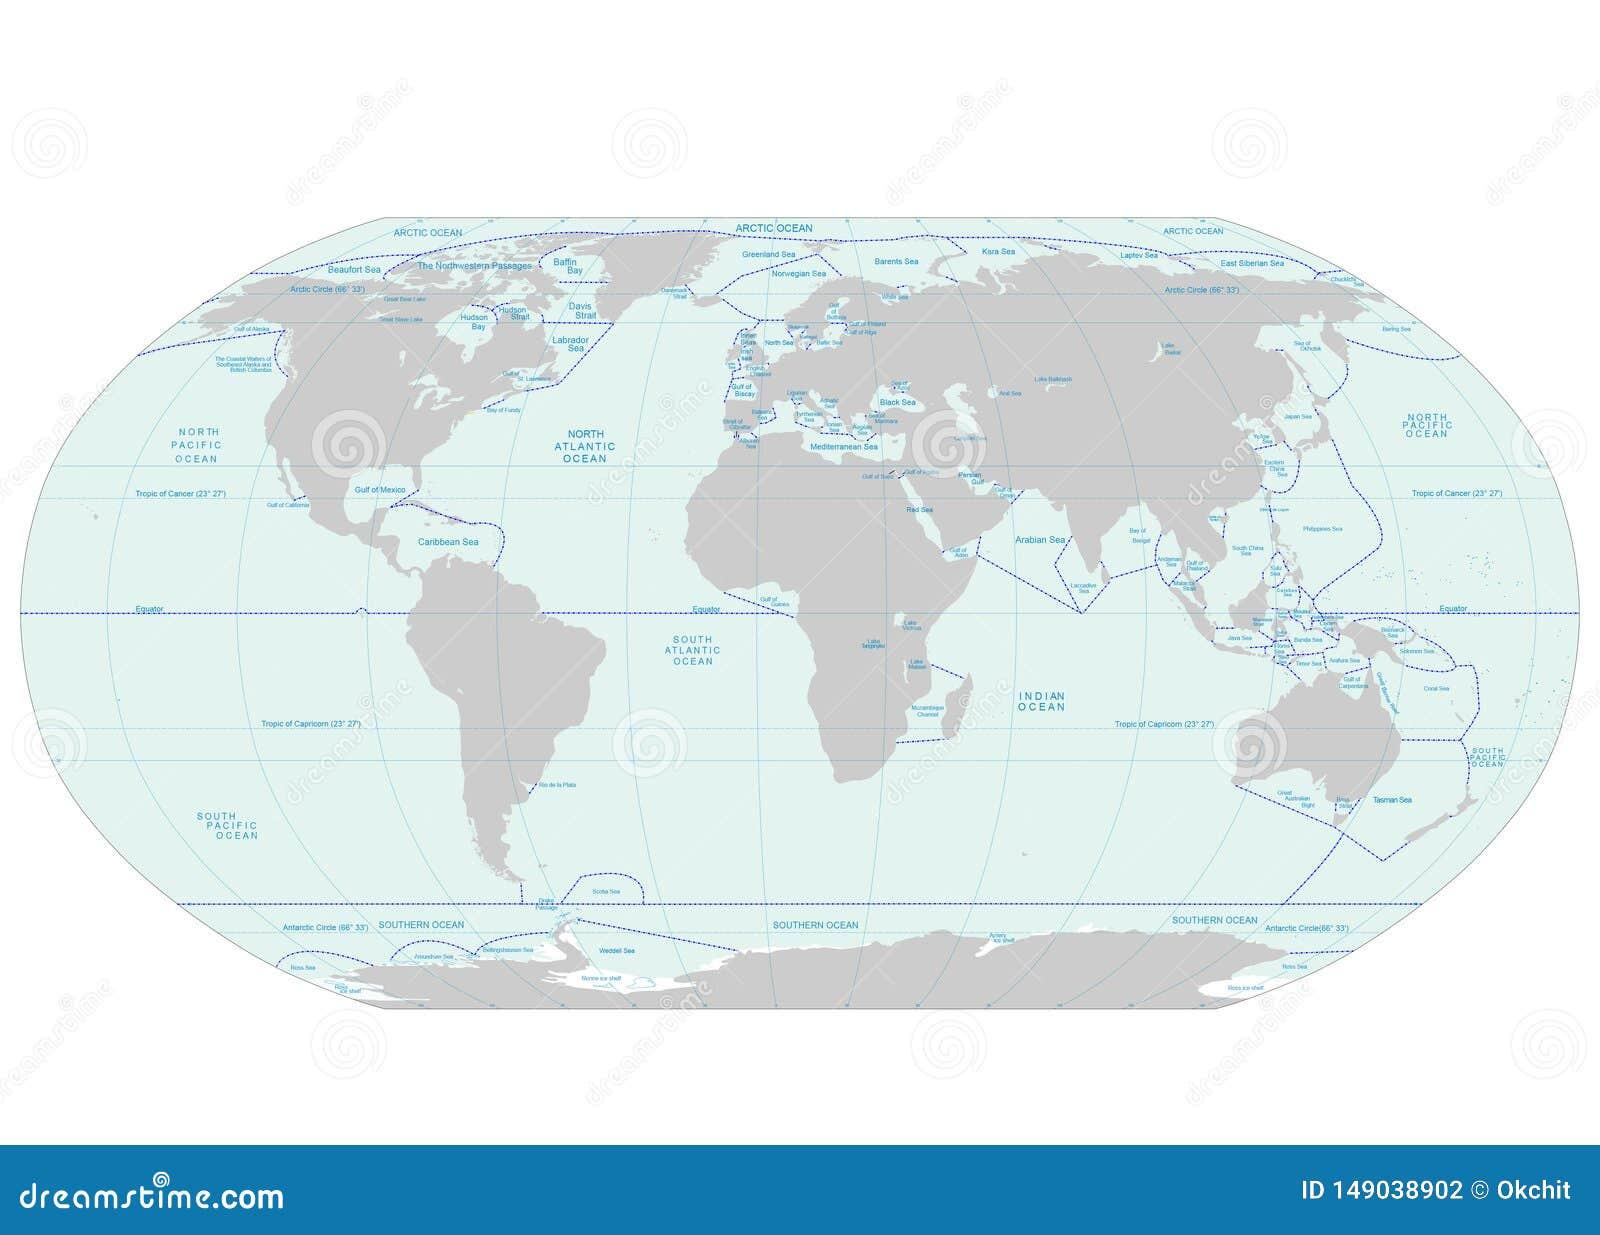 Image of: Oceans And Seas Boundaries Map Stock Vector Illustration Of Australia Europe 149038902